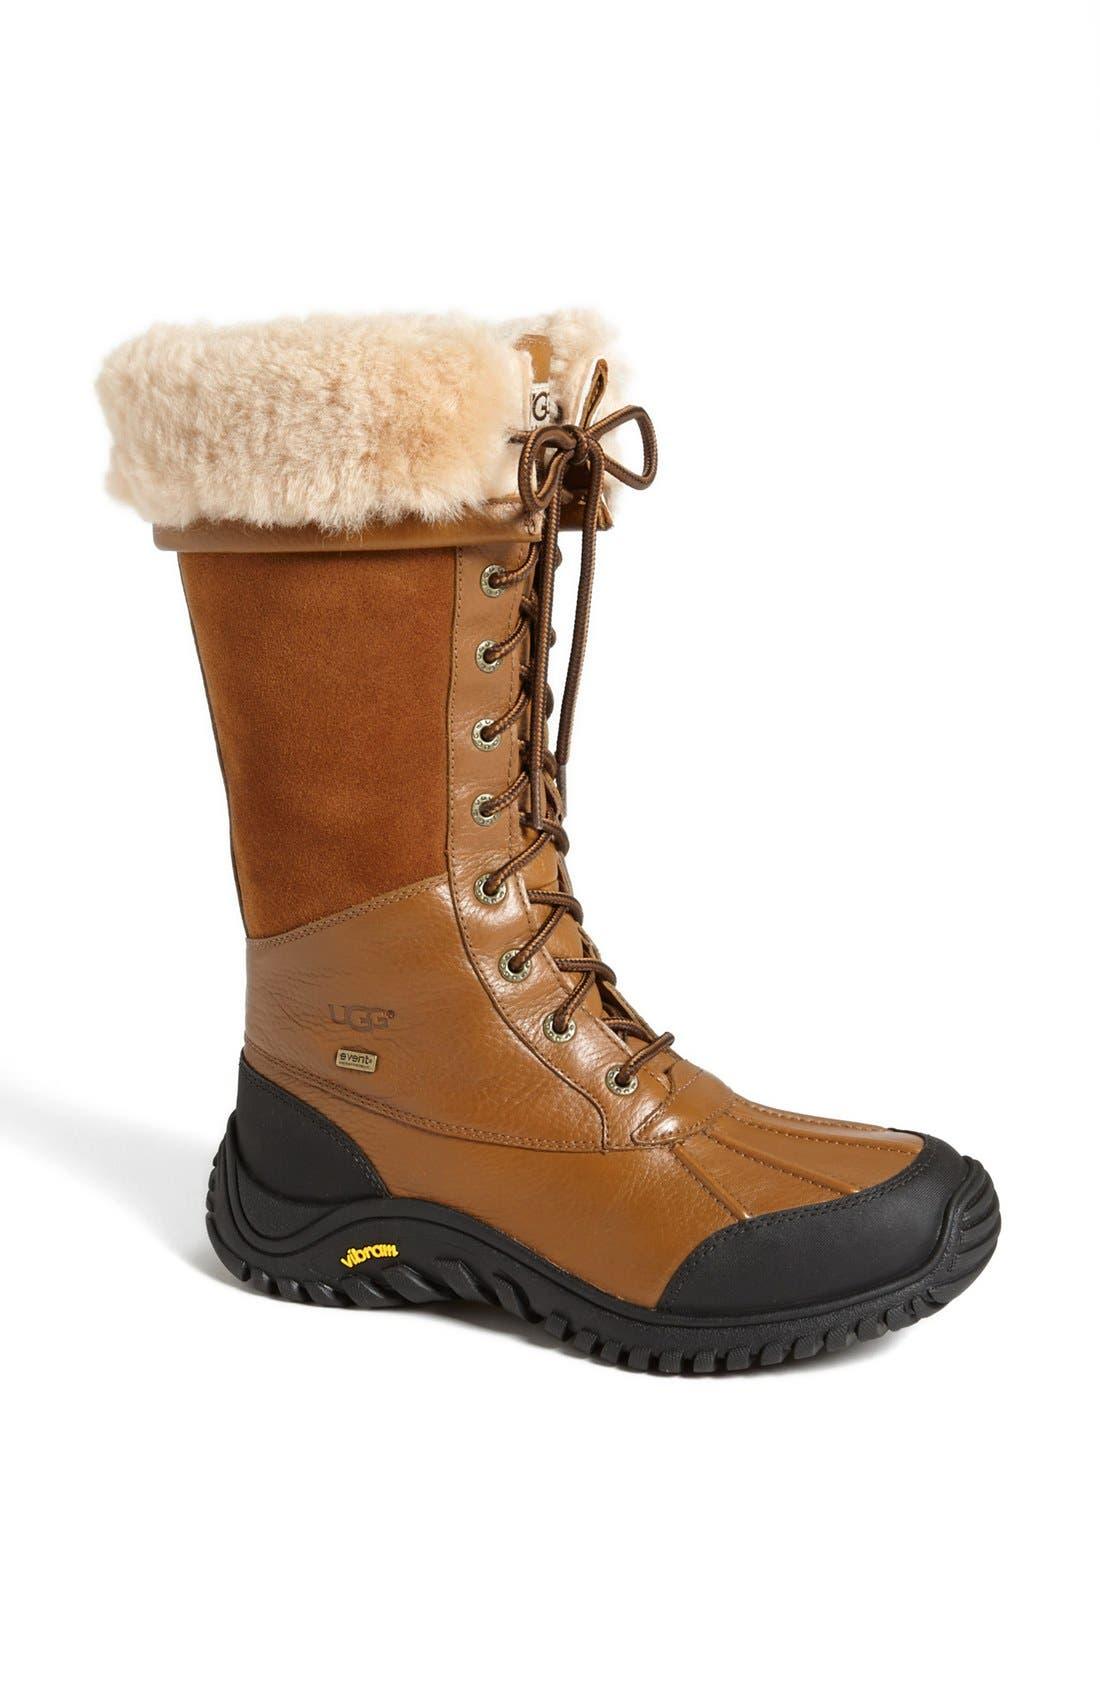 Main Image - UGG® Adirondack Waterproof Tall Boot (Women)